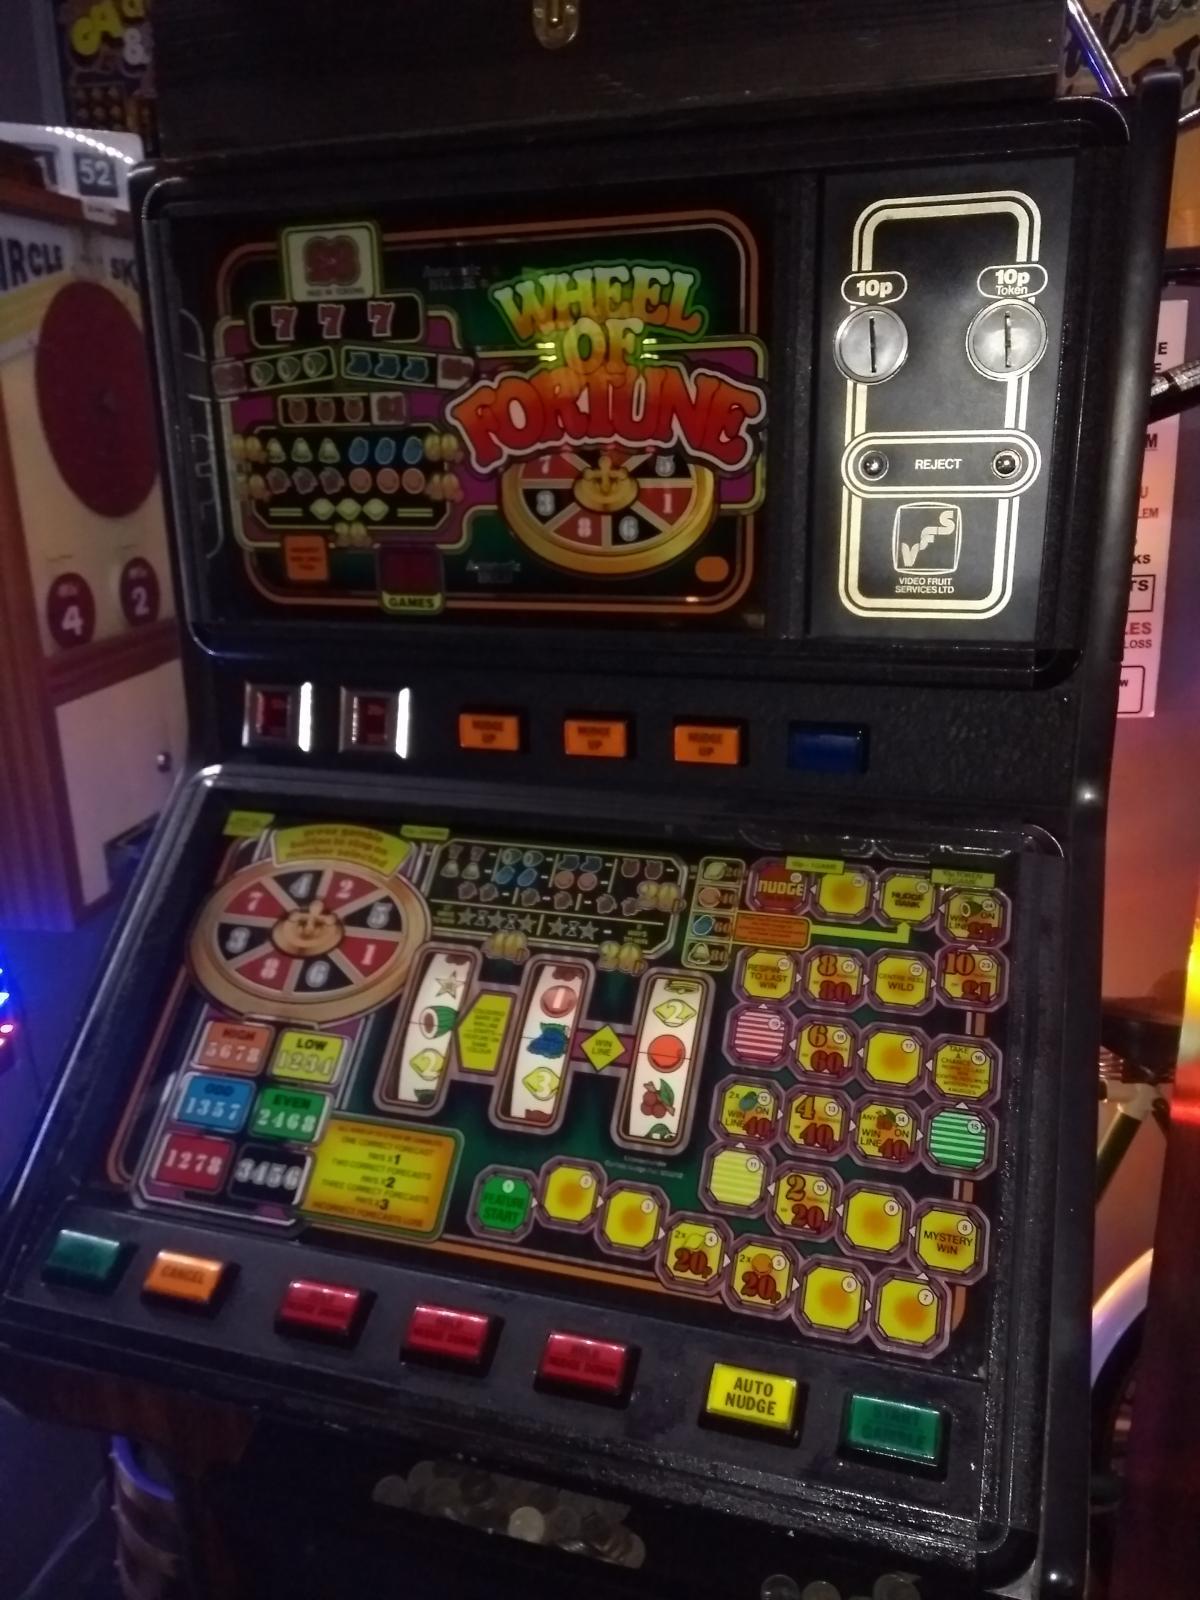 Captain cutthroat slots machines online